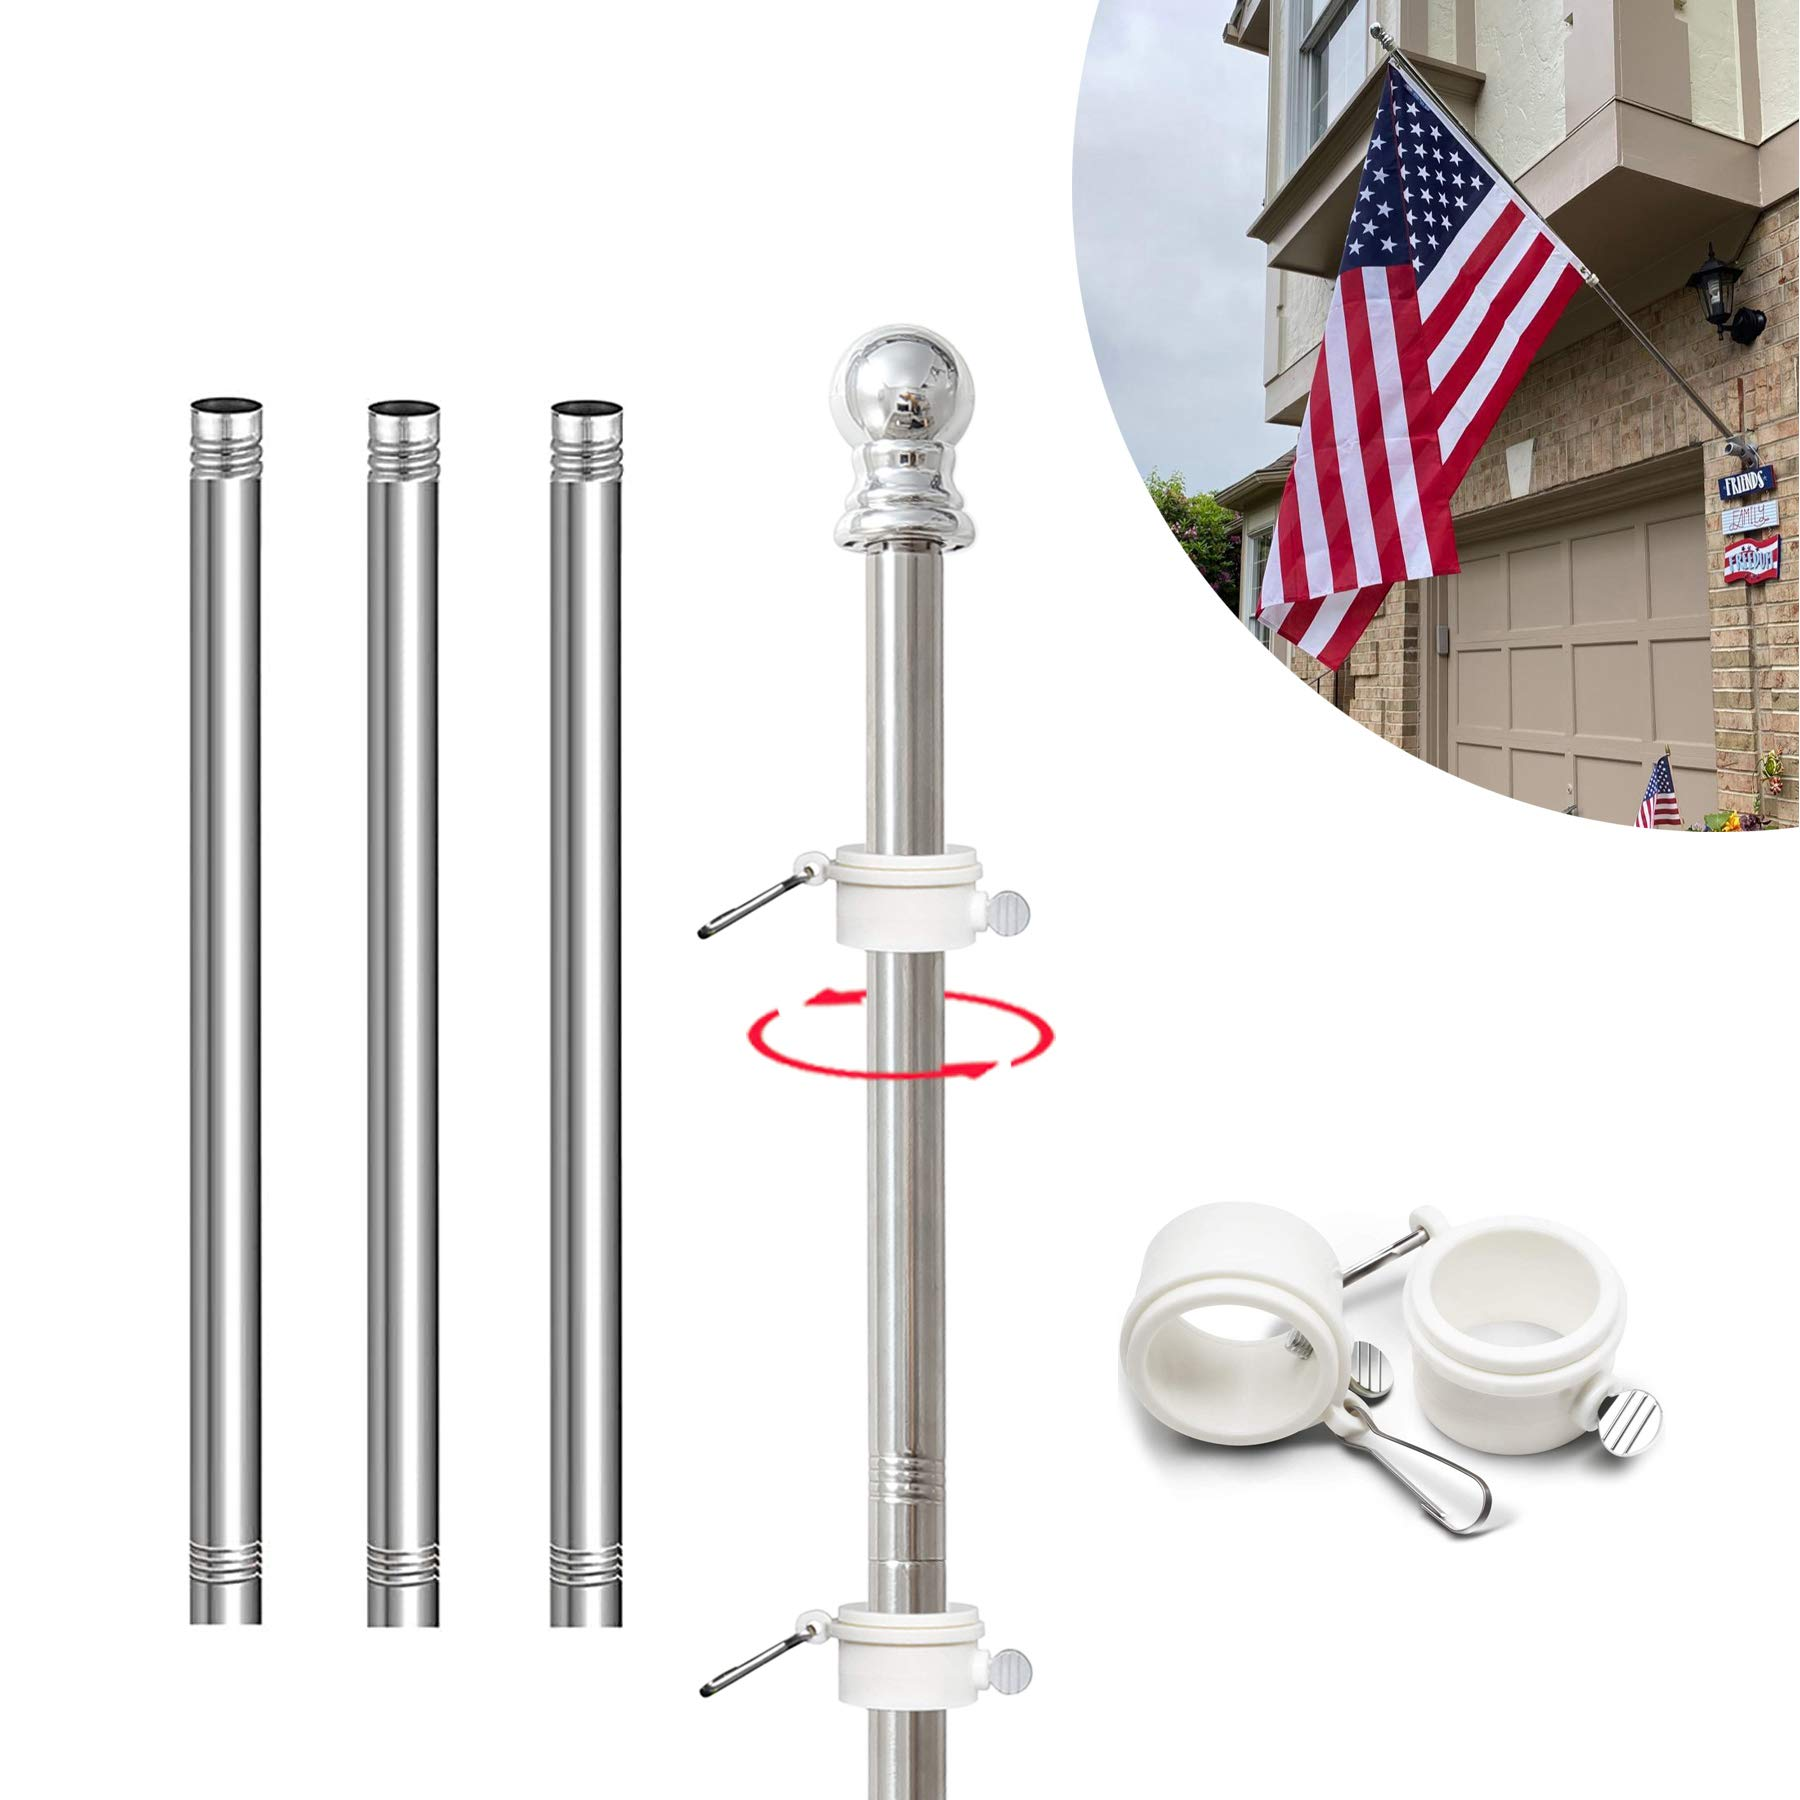 6FT Flag Pole 1 Inch Diameter Flag Pole for Flag Hanging Windproof Rustproof New